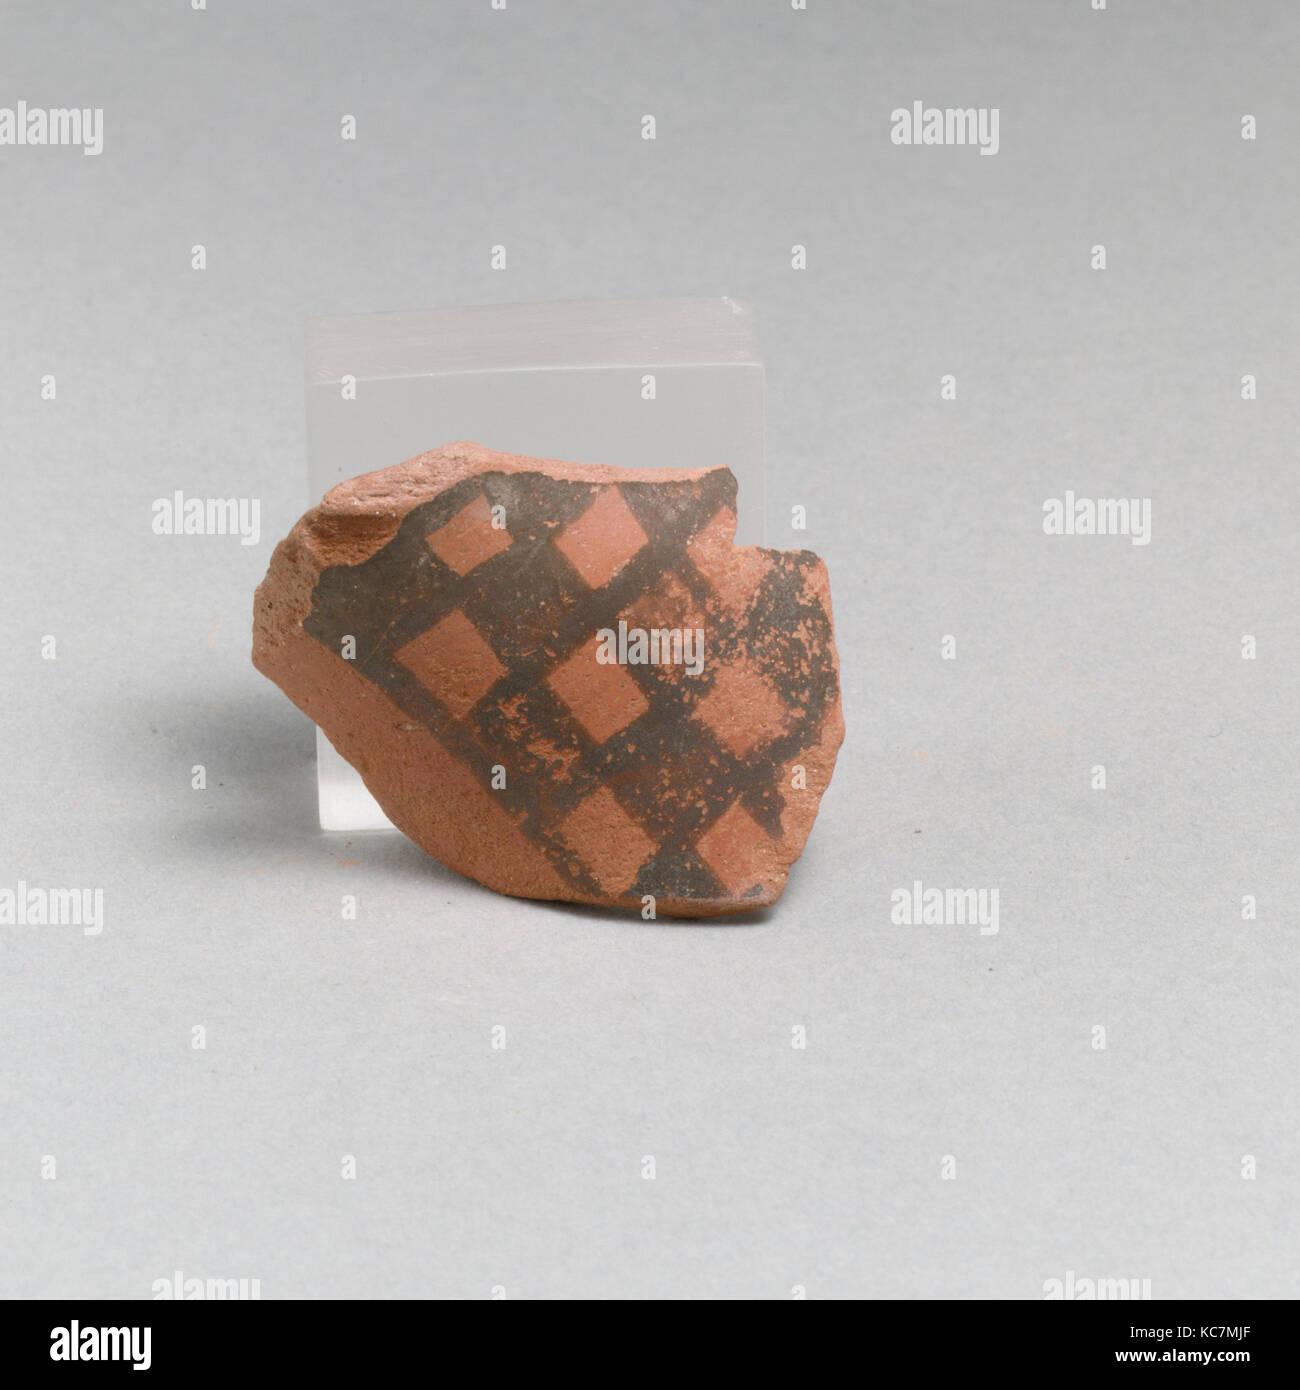 Vase fragment, Geometric, East Greek/Sardis, Lydian, Terracotta, Overall: 1 3/4 x 1 1/2in. (4.4 x 3.8cm), Vases - Stock Image